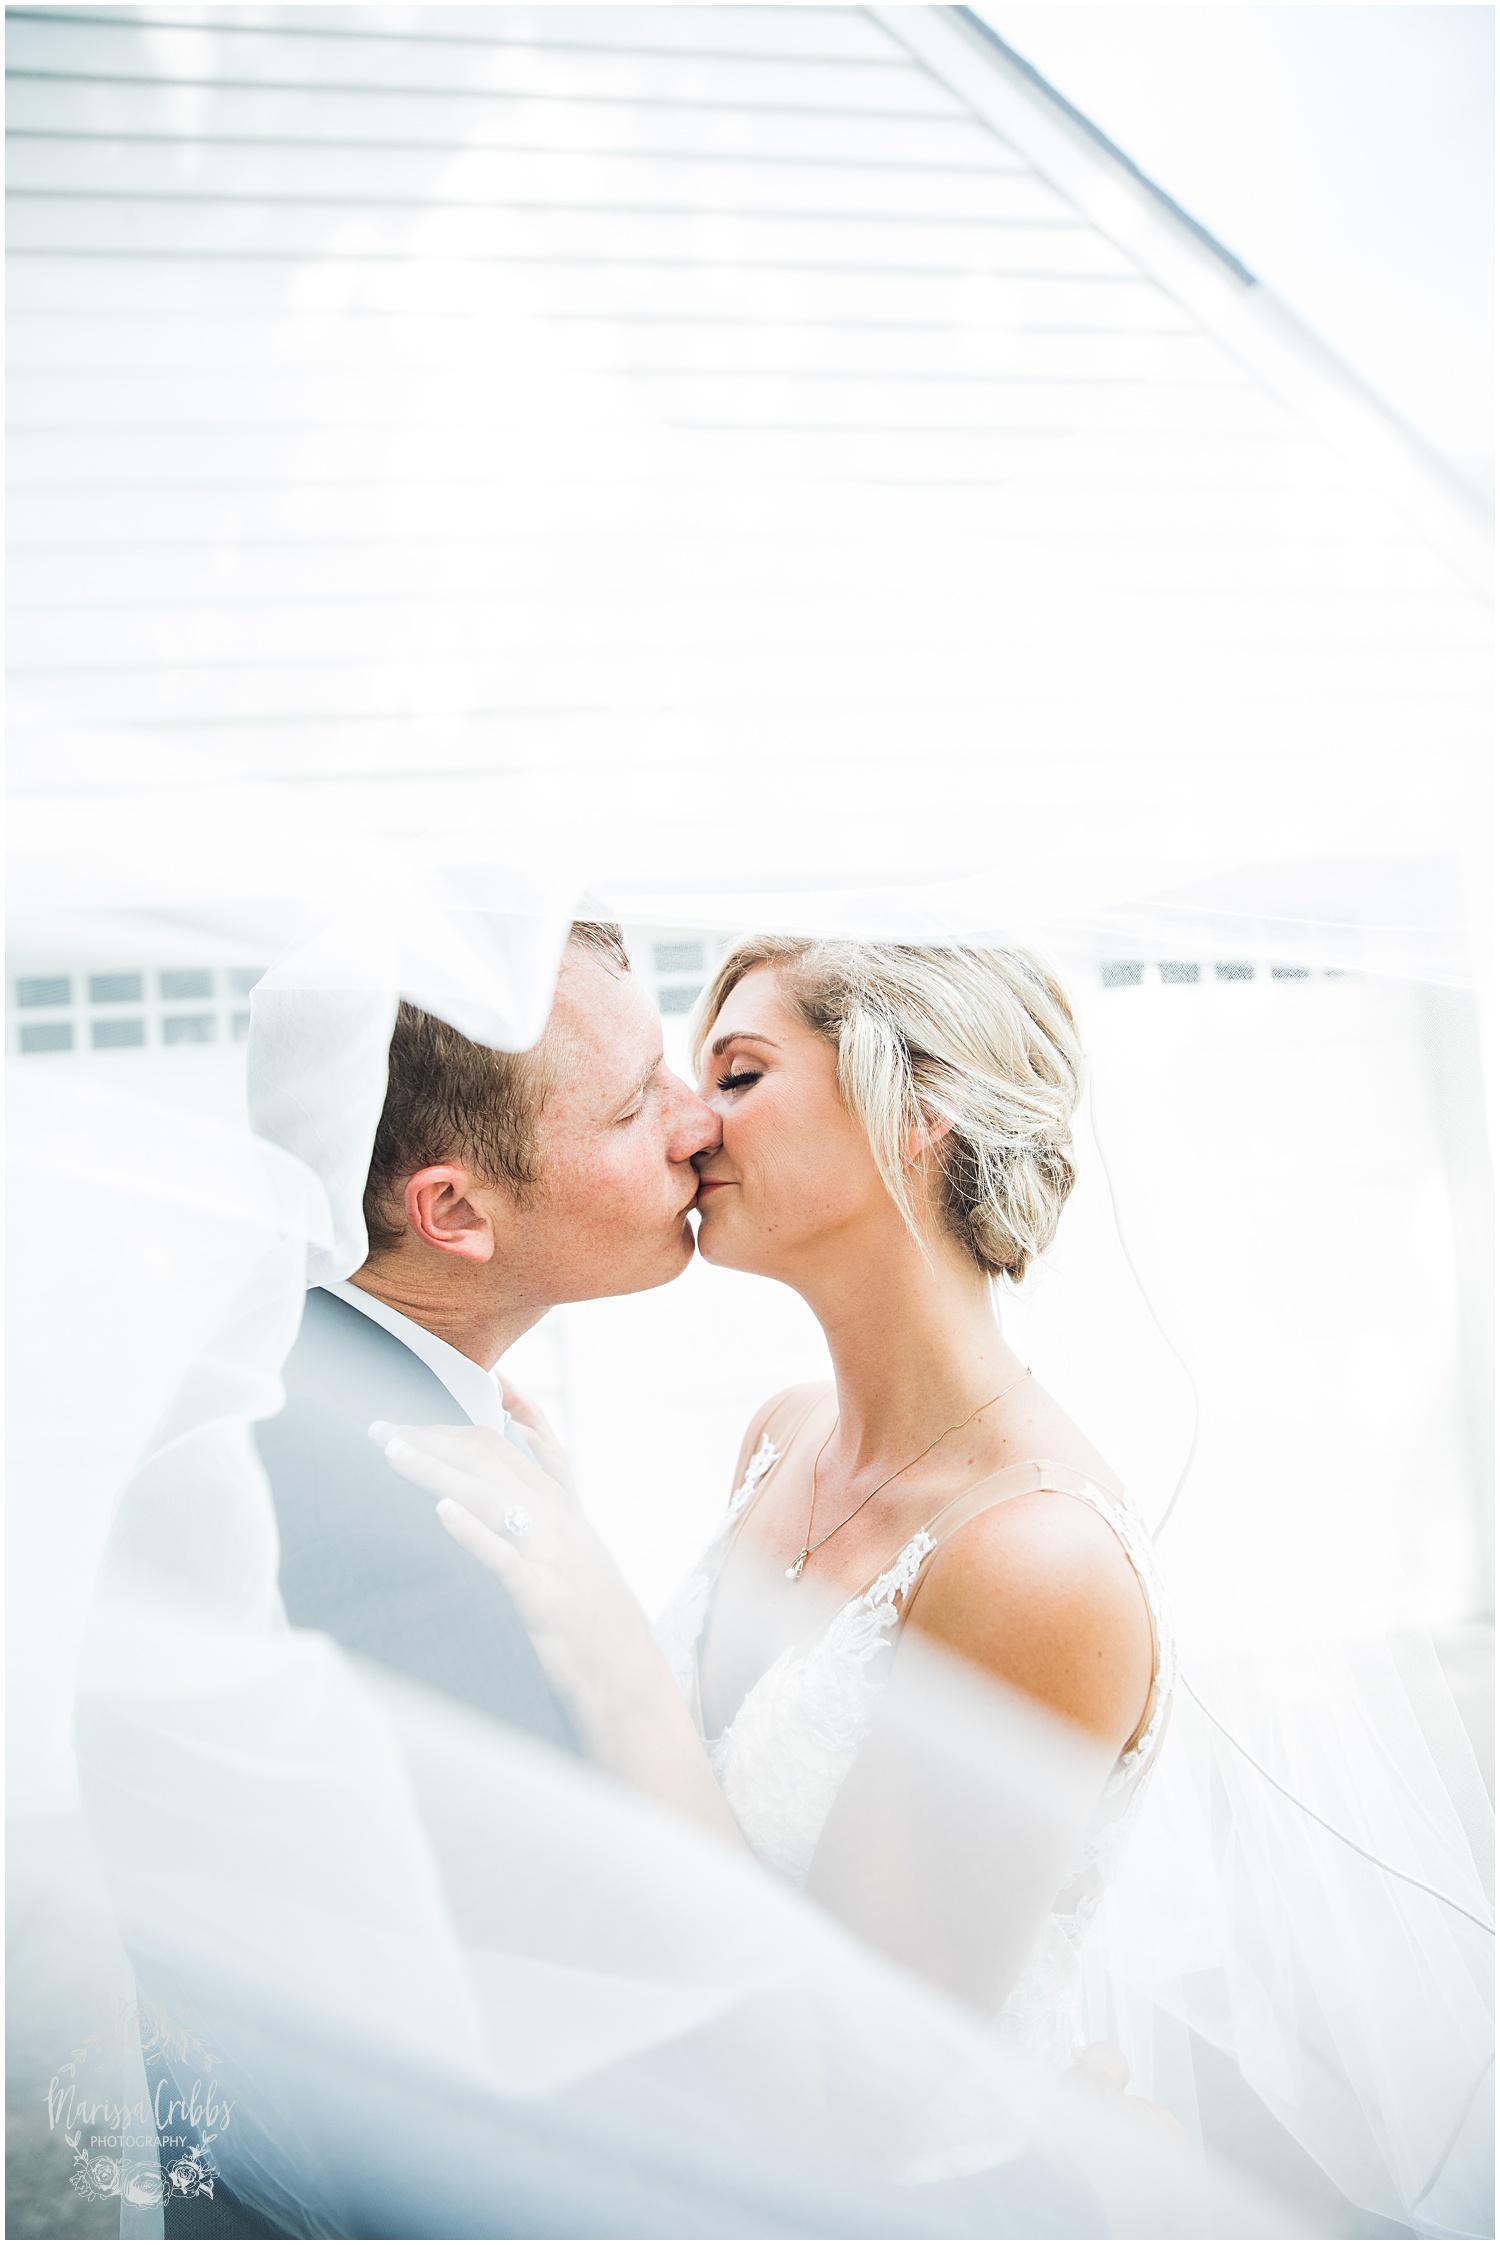 CHELSEA & BEN MARRIED BLOG  | MARISSA CRIBBS PHOTOGRAPHY_8576.jpg